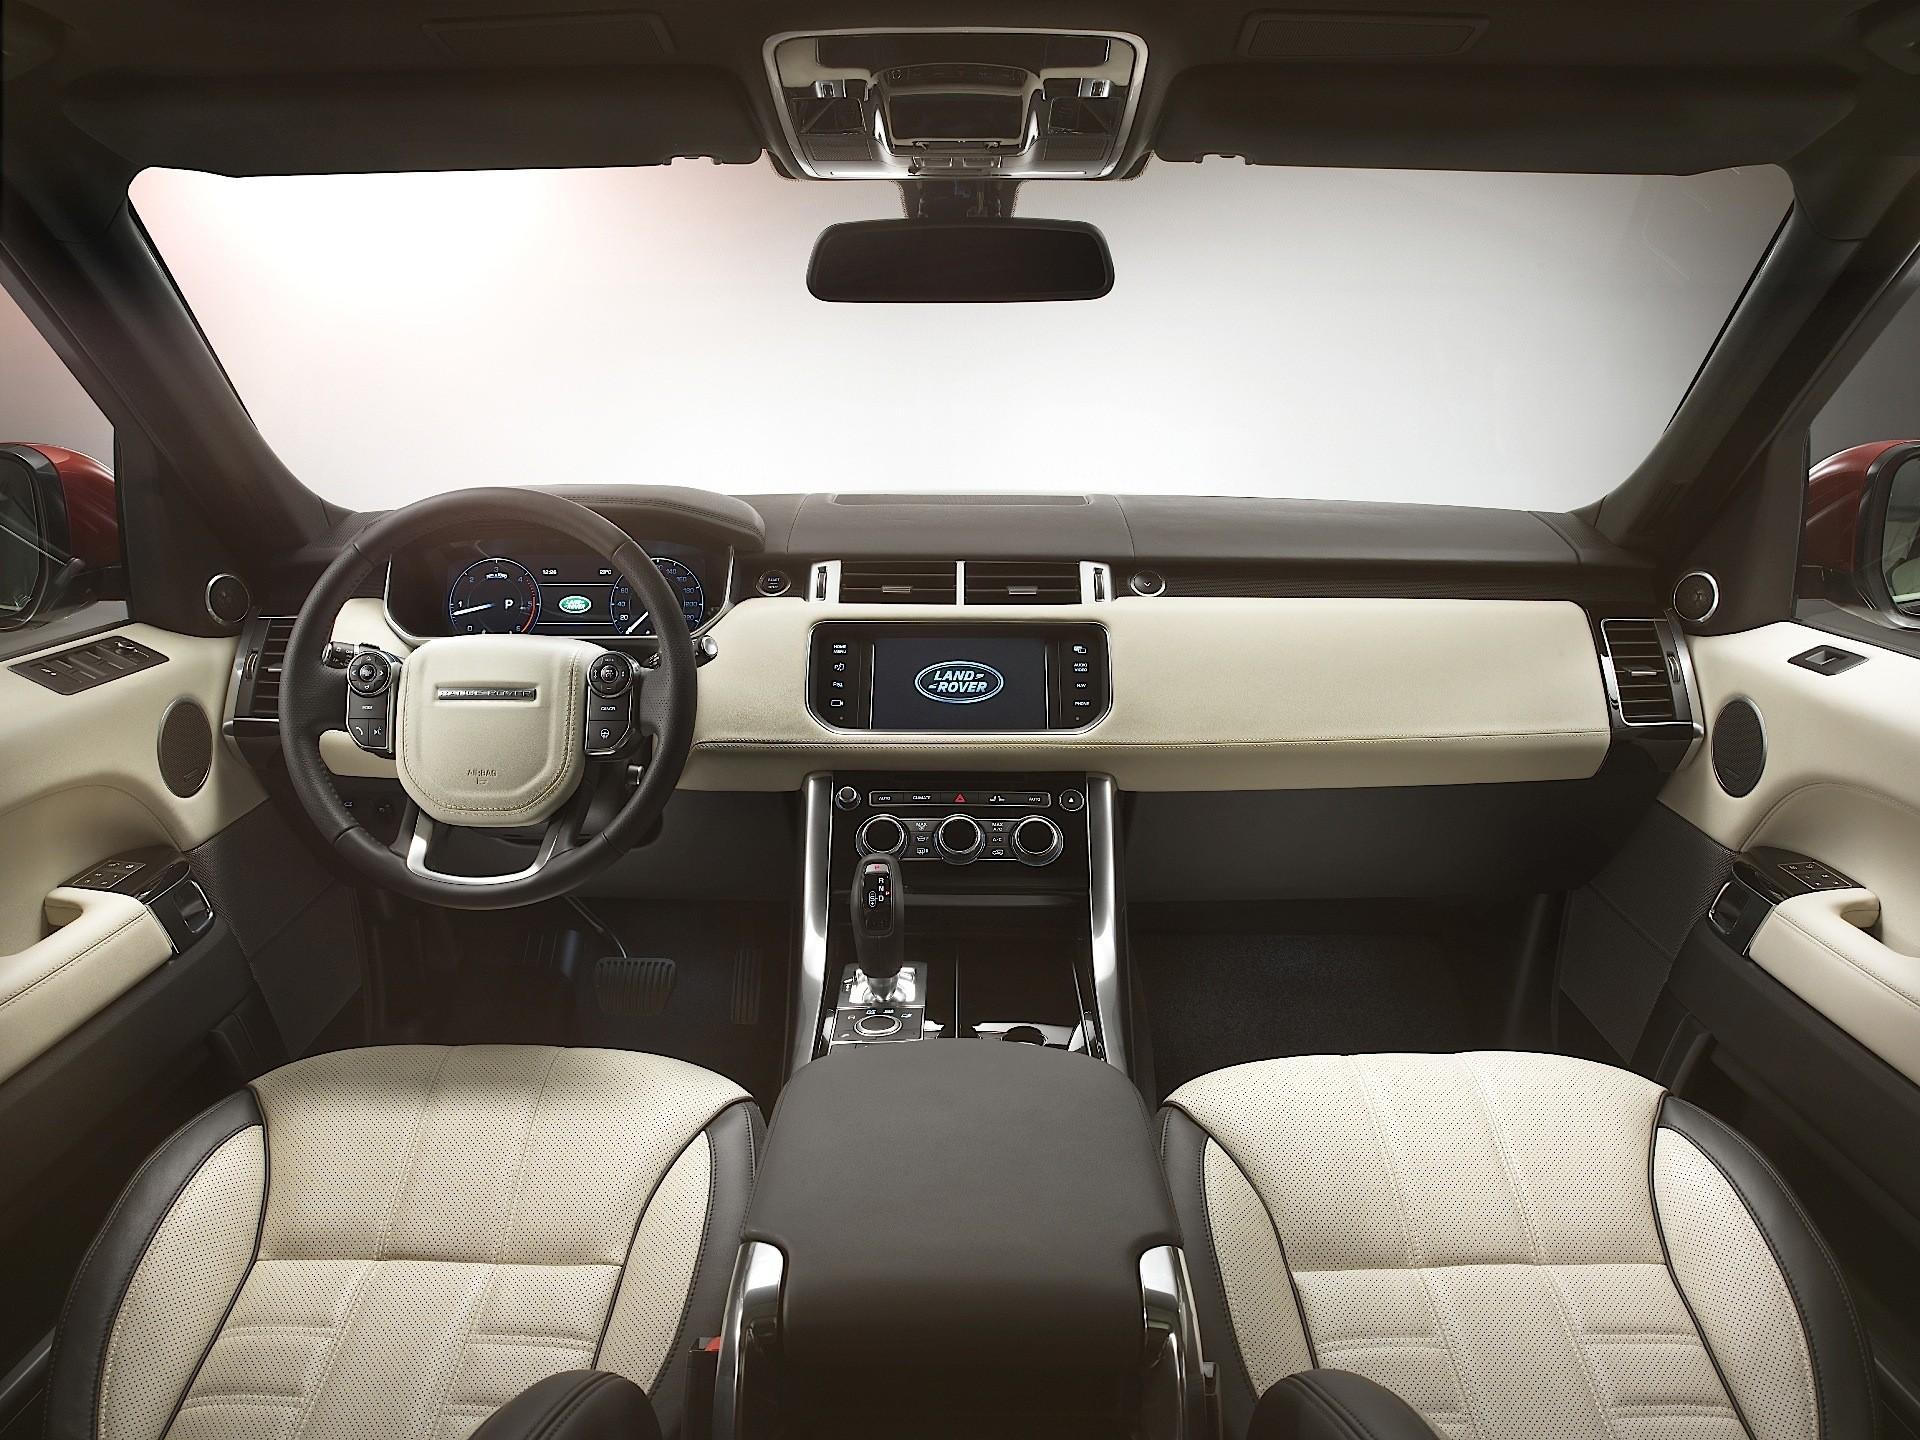 2016 Range Rover Sport Diesel to Cost $66,450 - Photo Gallery